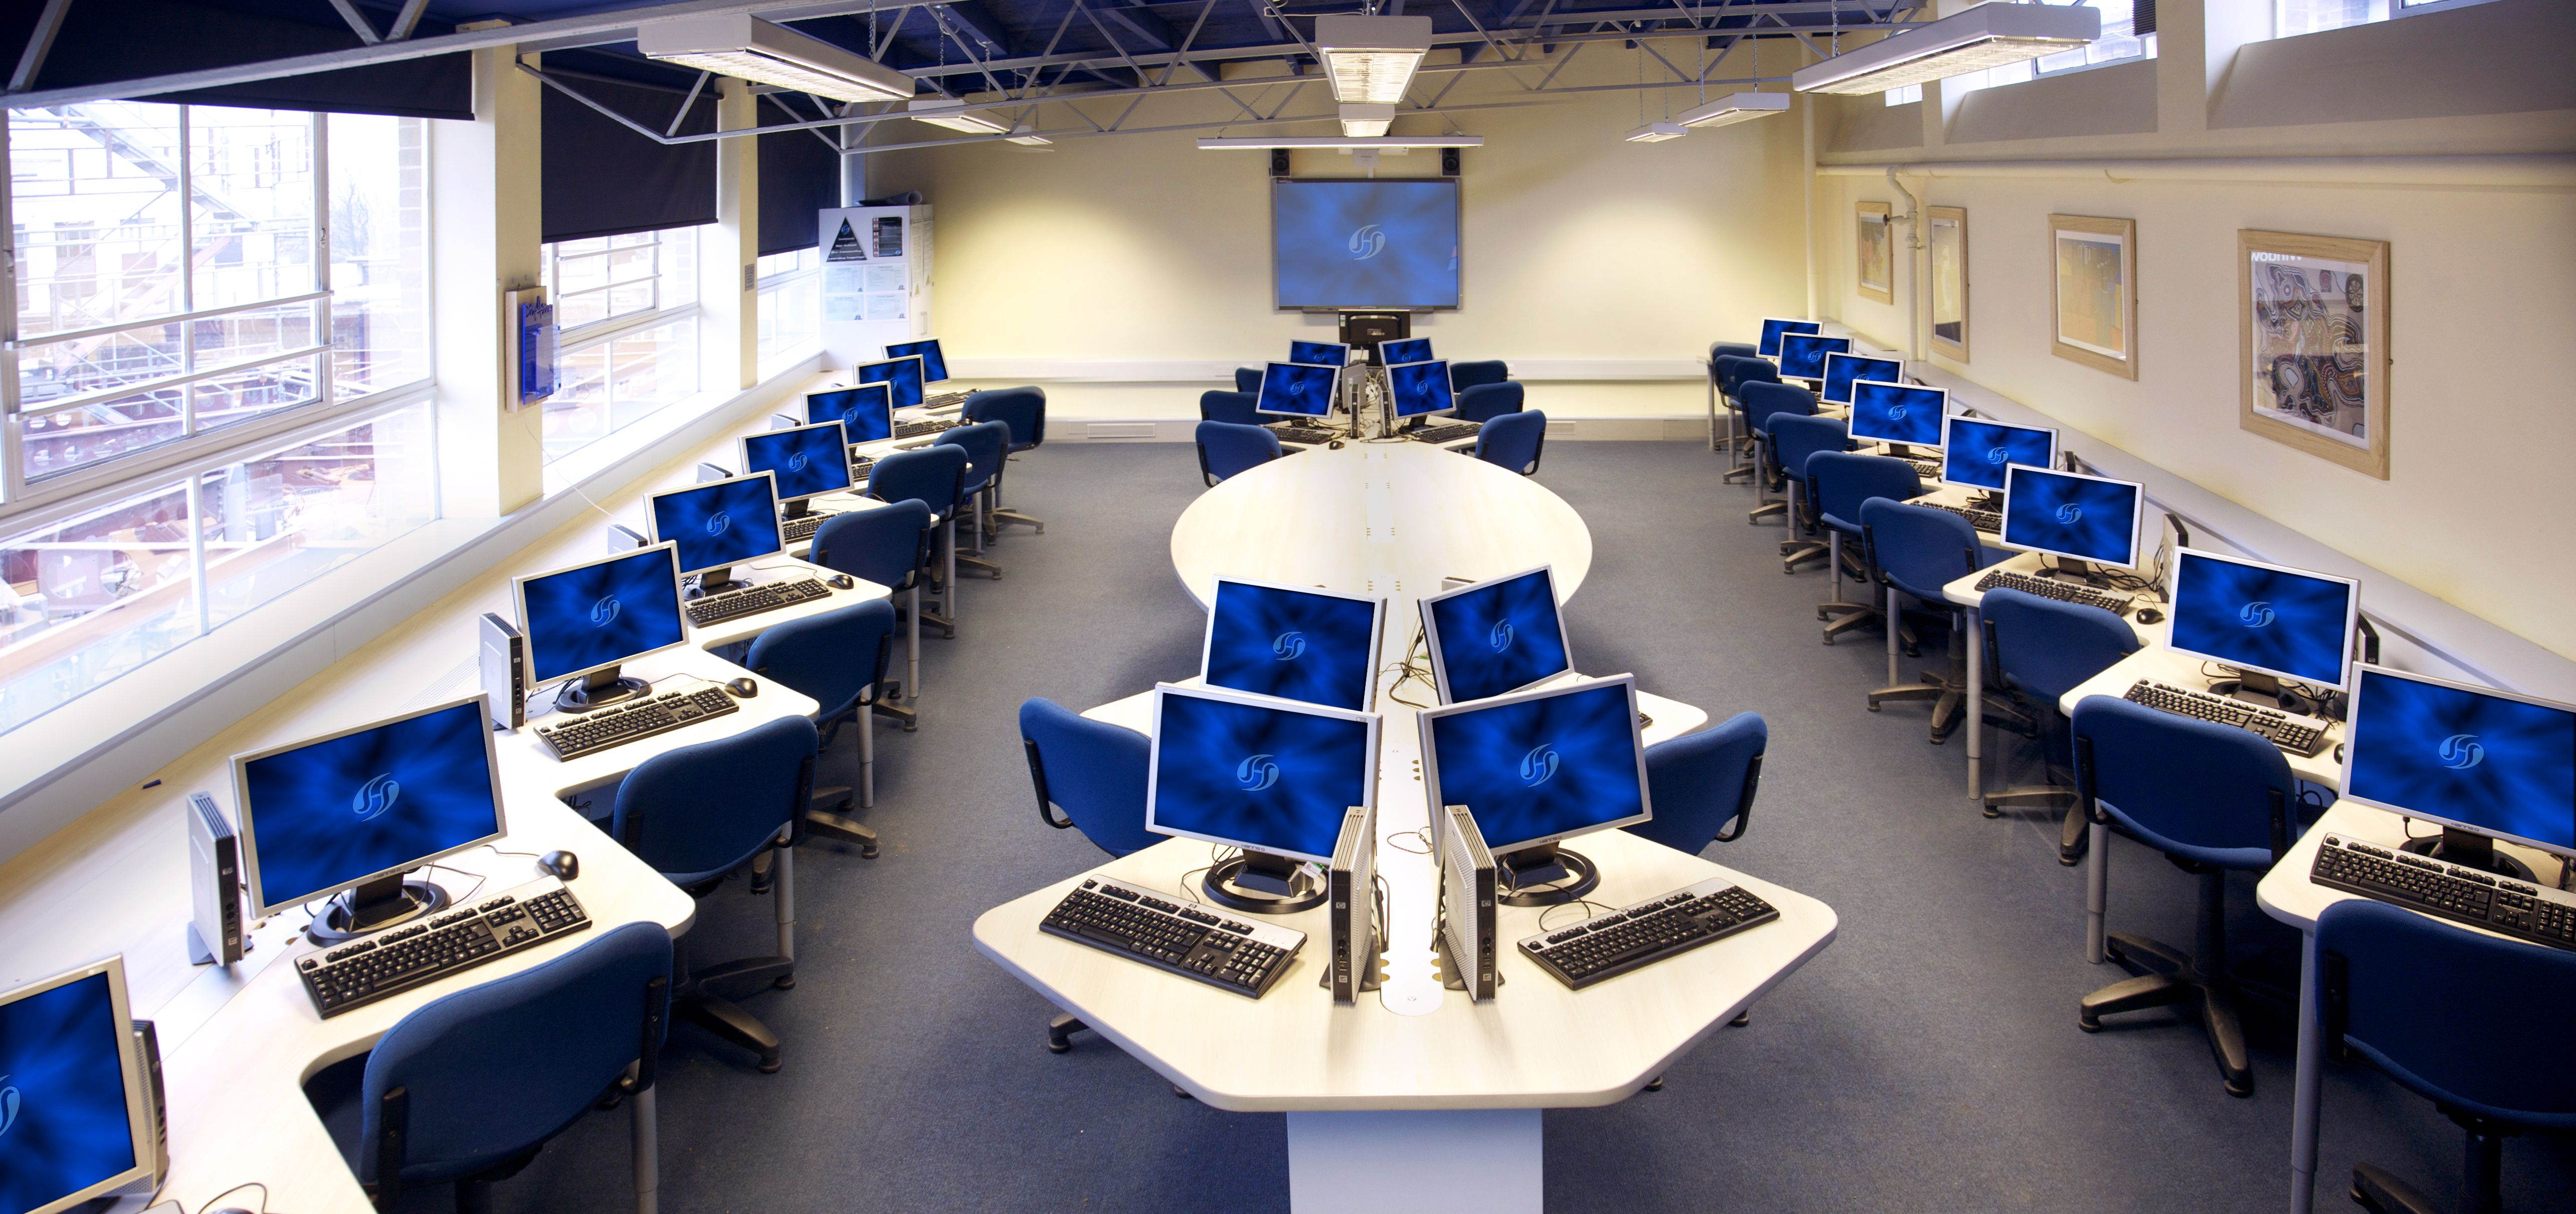 Future Computer Classroom Design